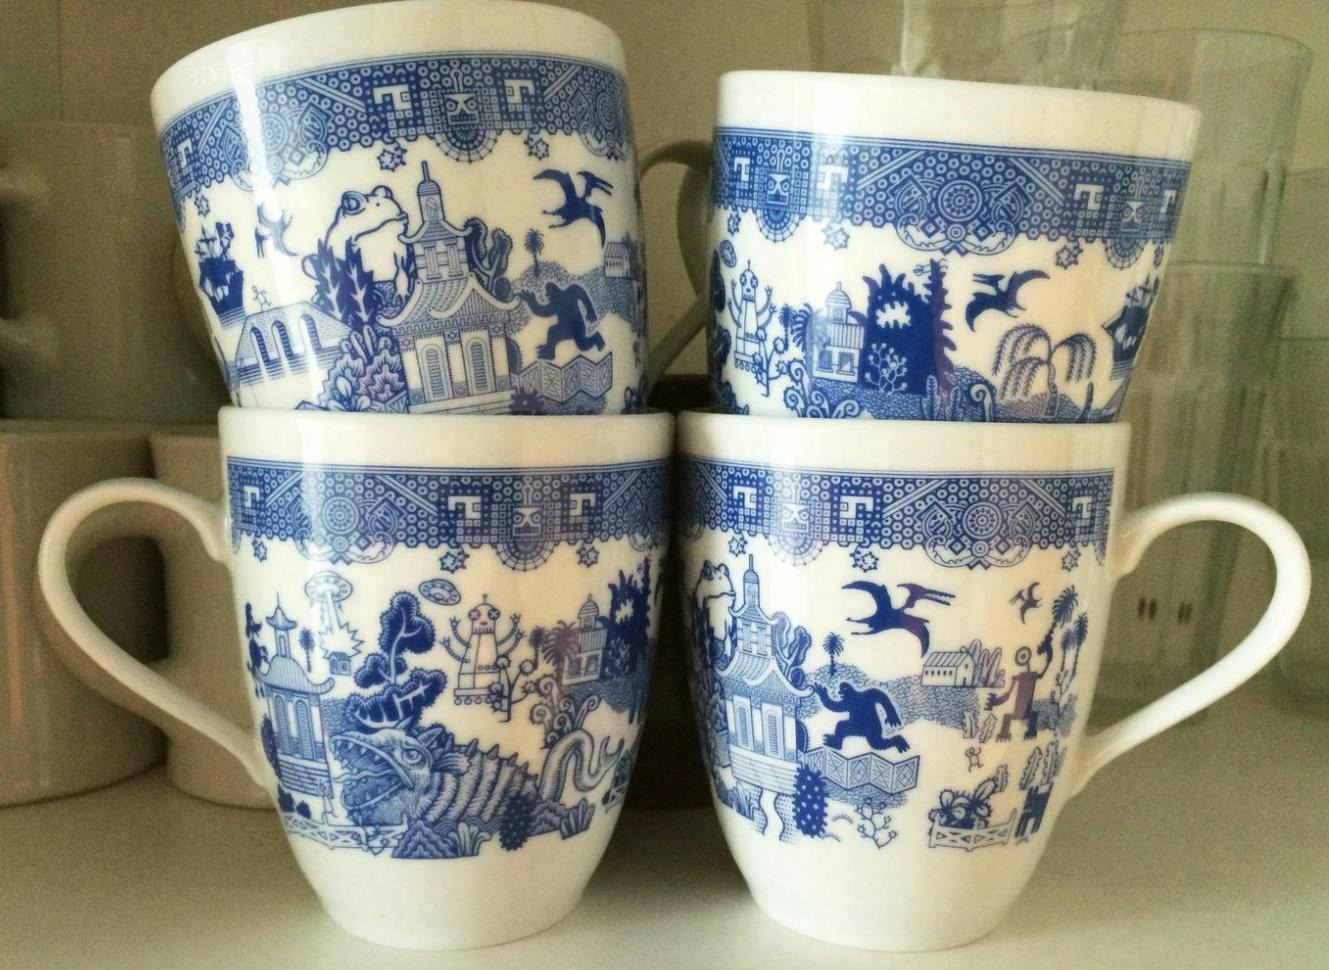 Calamityware 12-oz Coffee Mugs Porcelain Cup